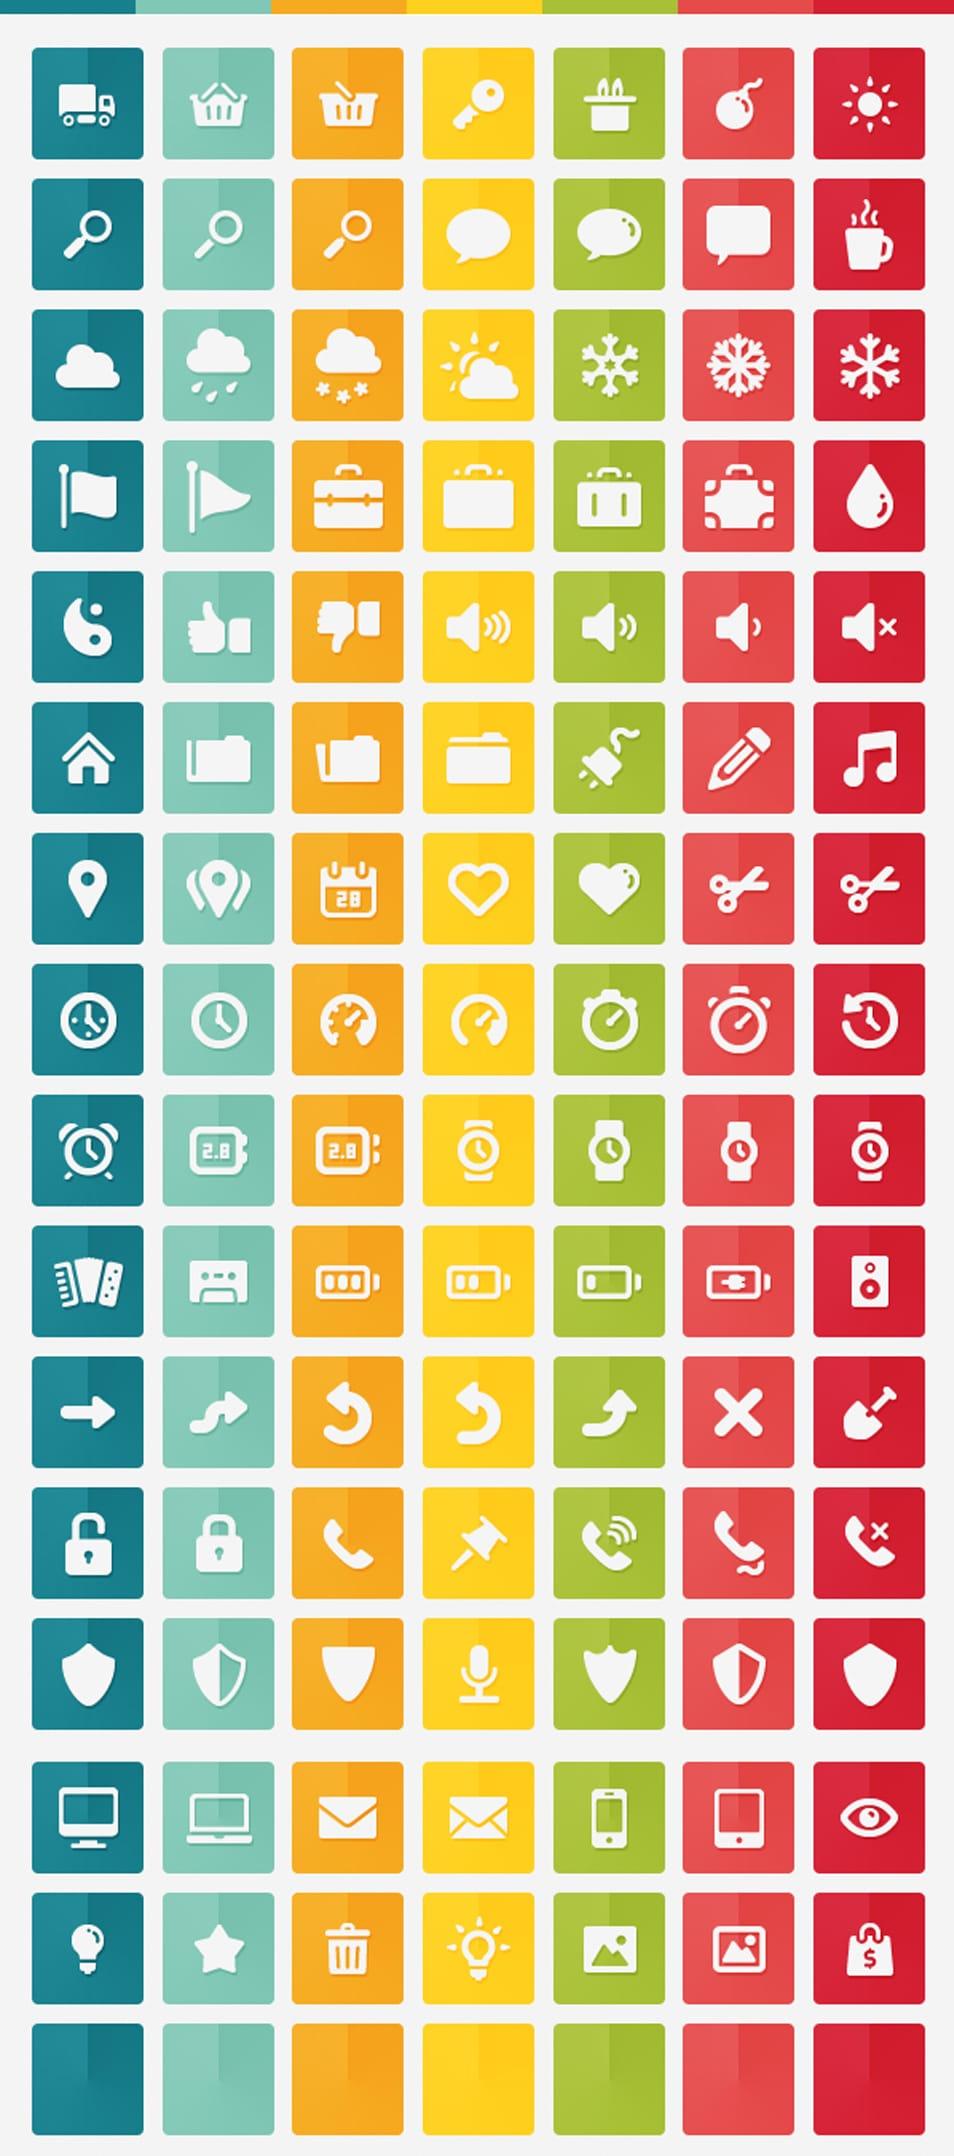 105 free flat icons – Gmarellile